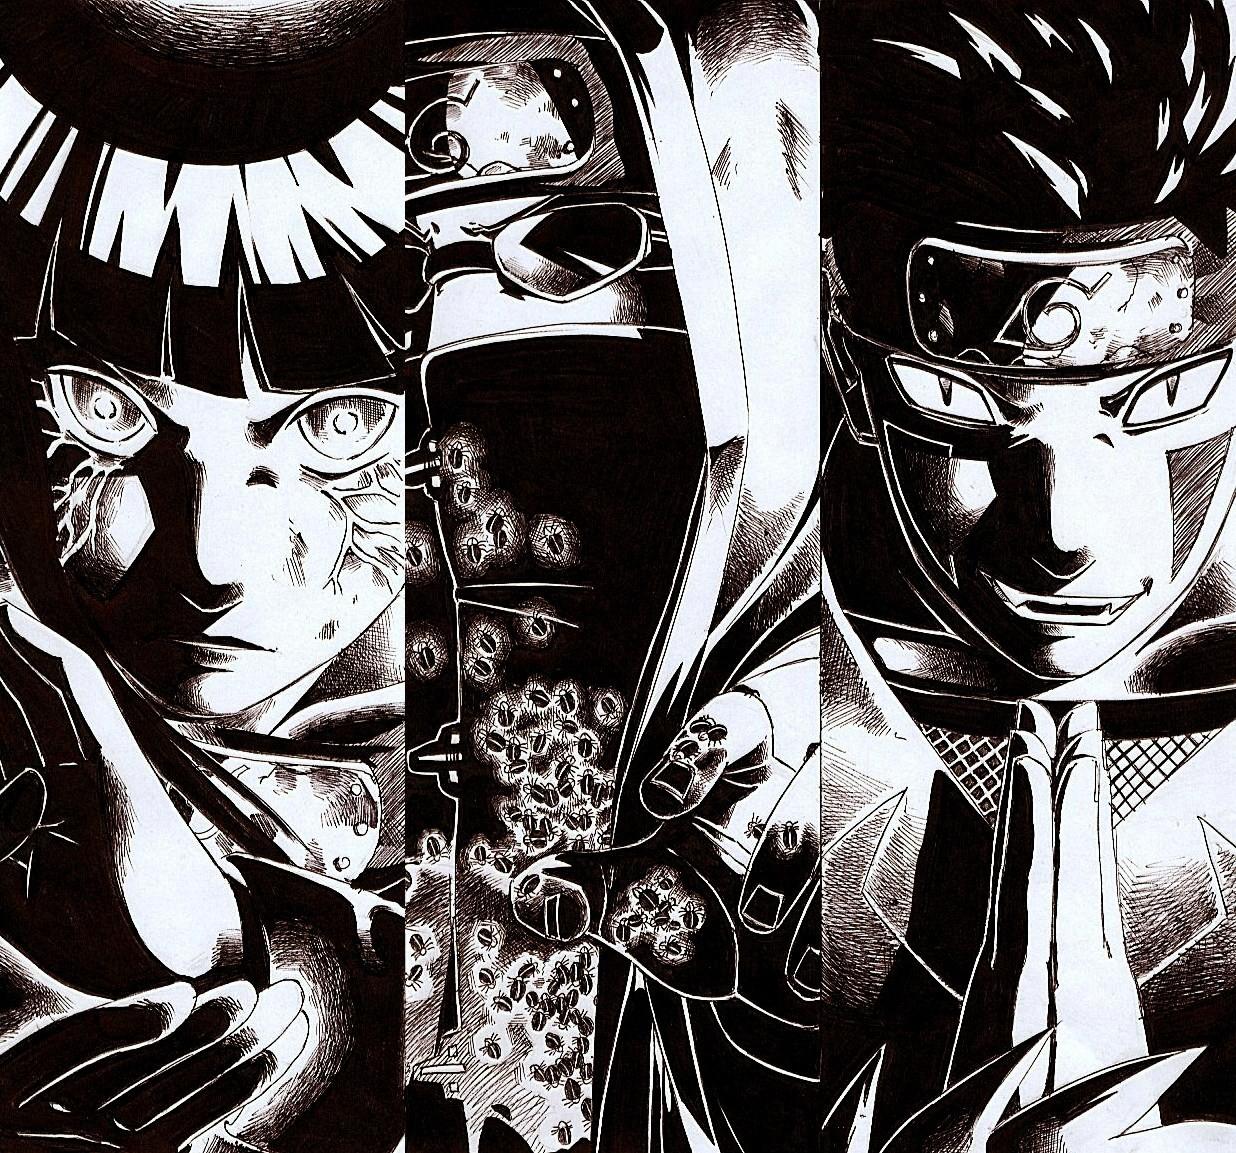 Kumpulan Contoh Gambar Sketsa Naruto Hitam Putih Informasi